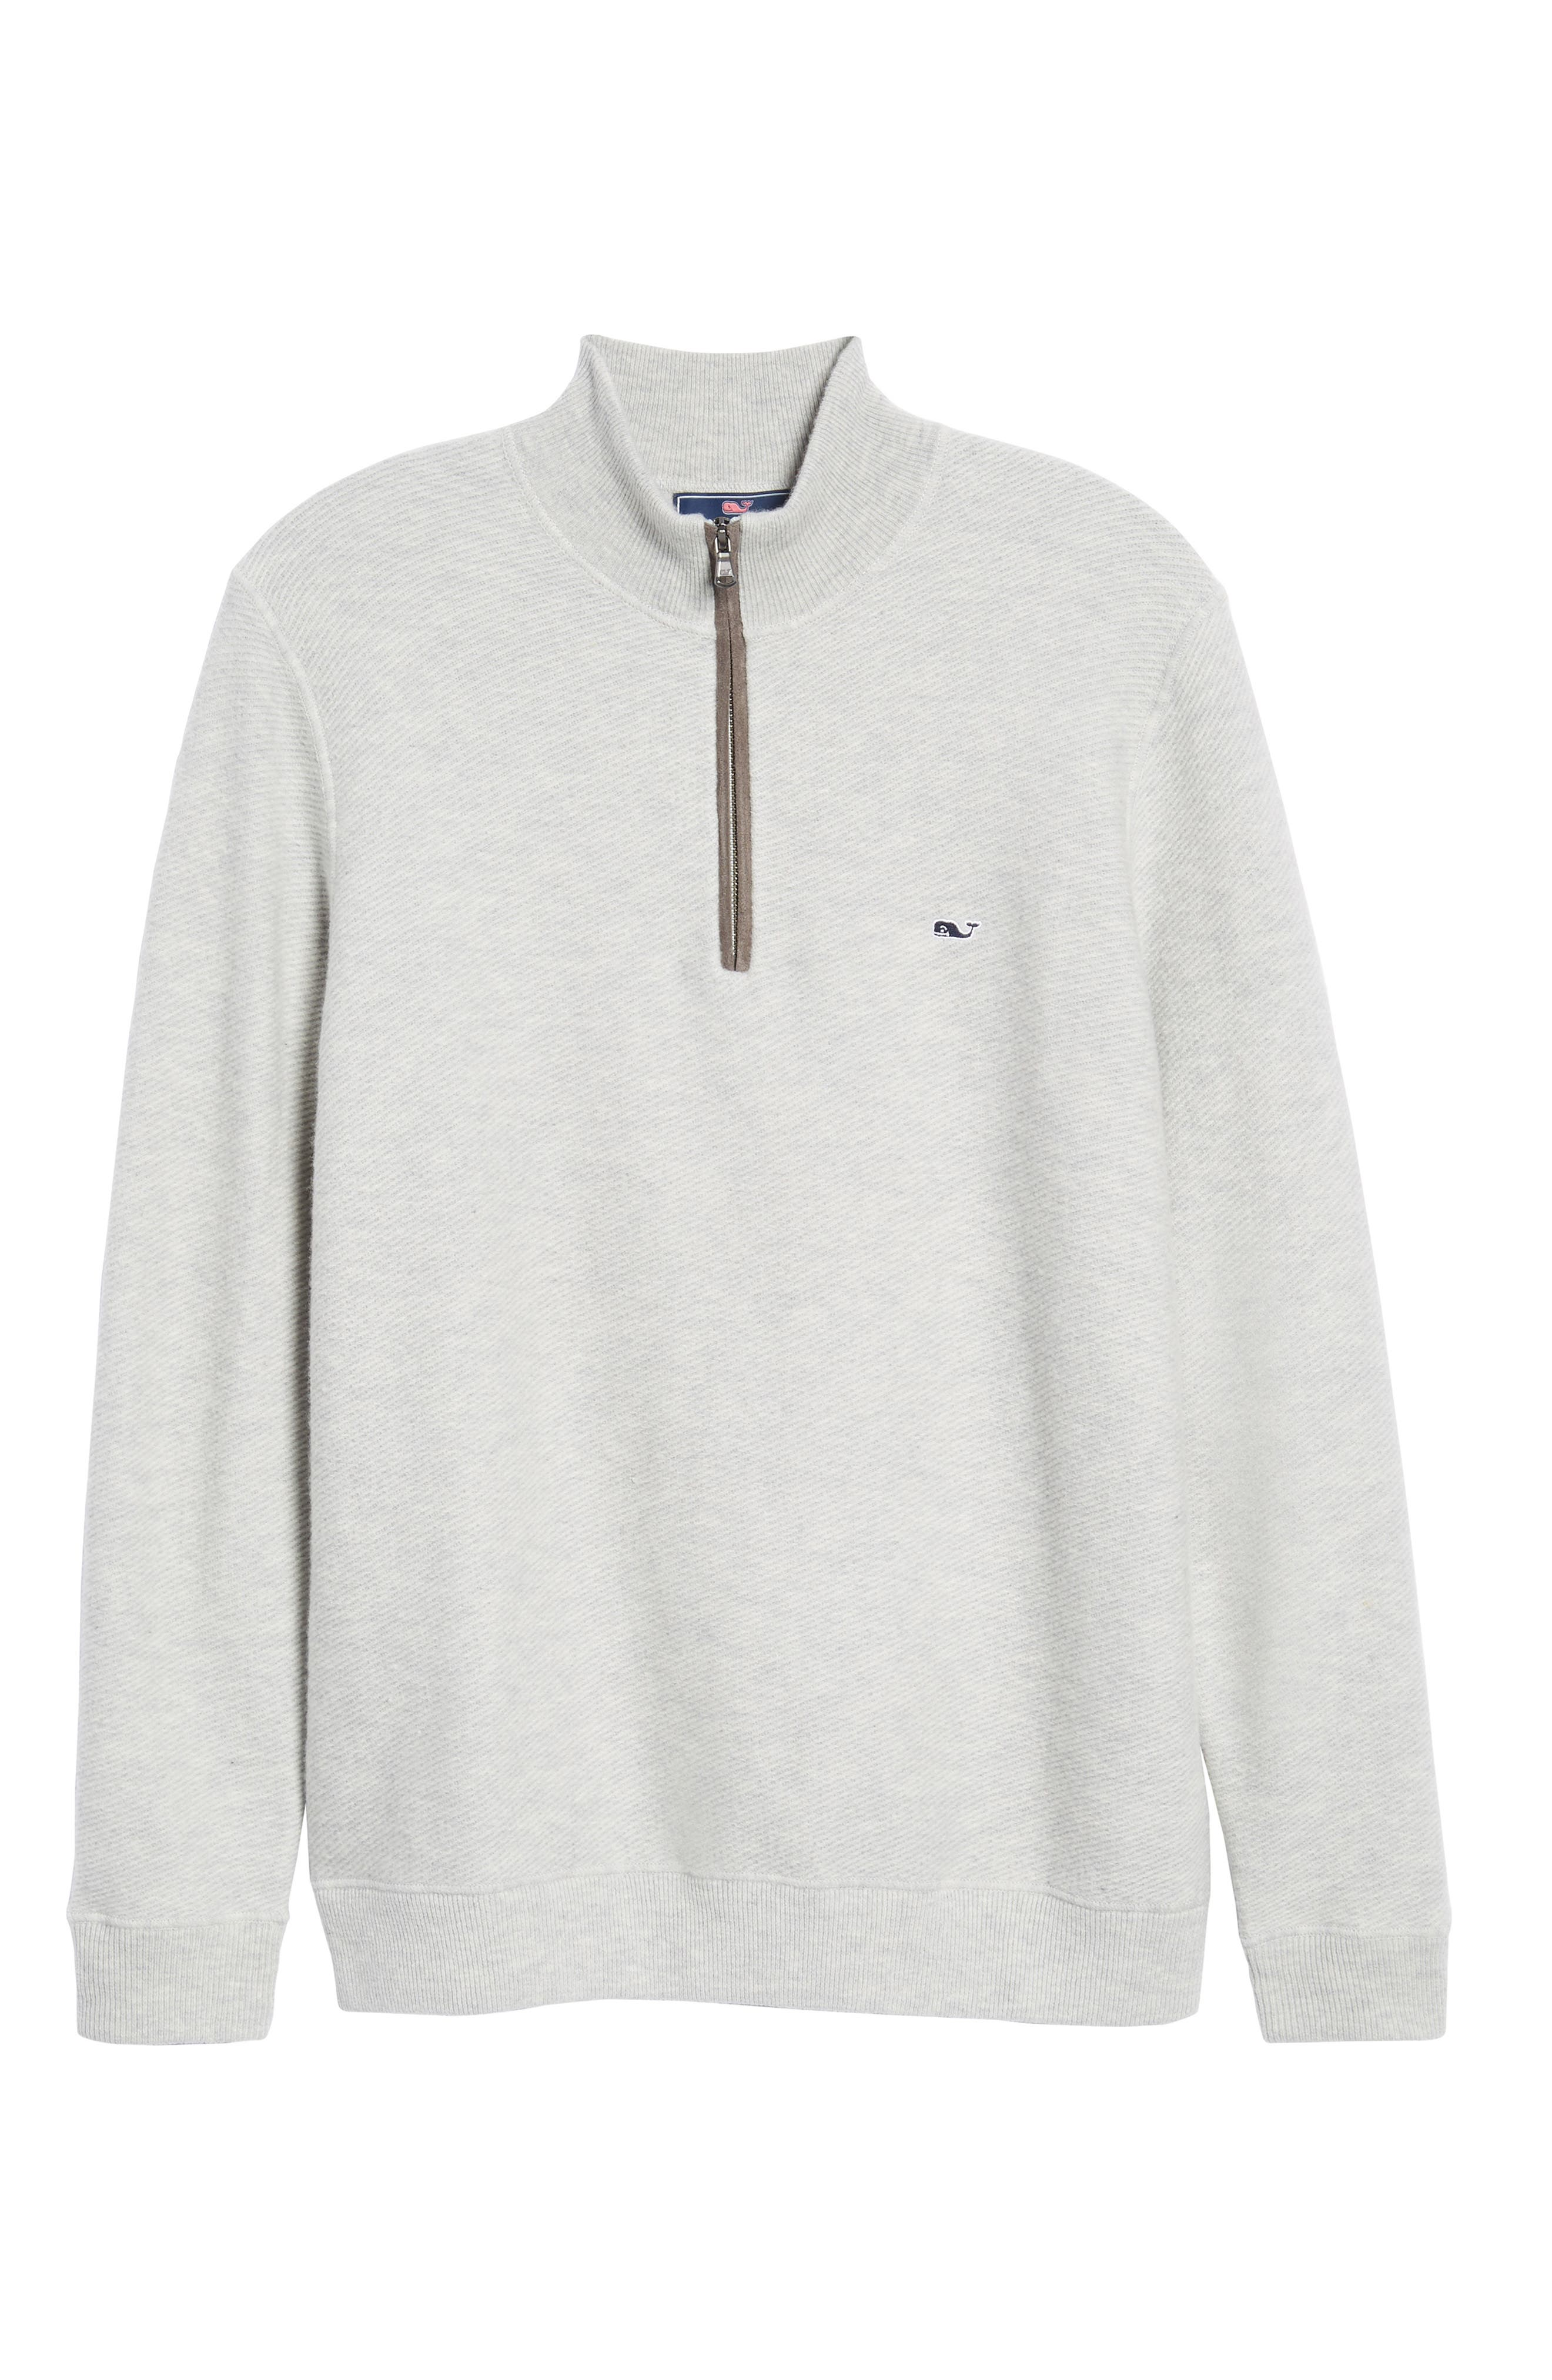 Merino Wool Twill Stitch Quarter Zip Sweater,                             Alternate thumbnail 6, color,                             039